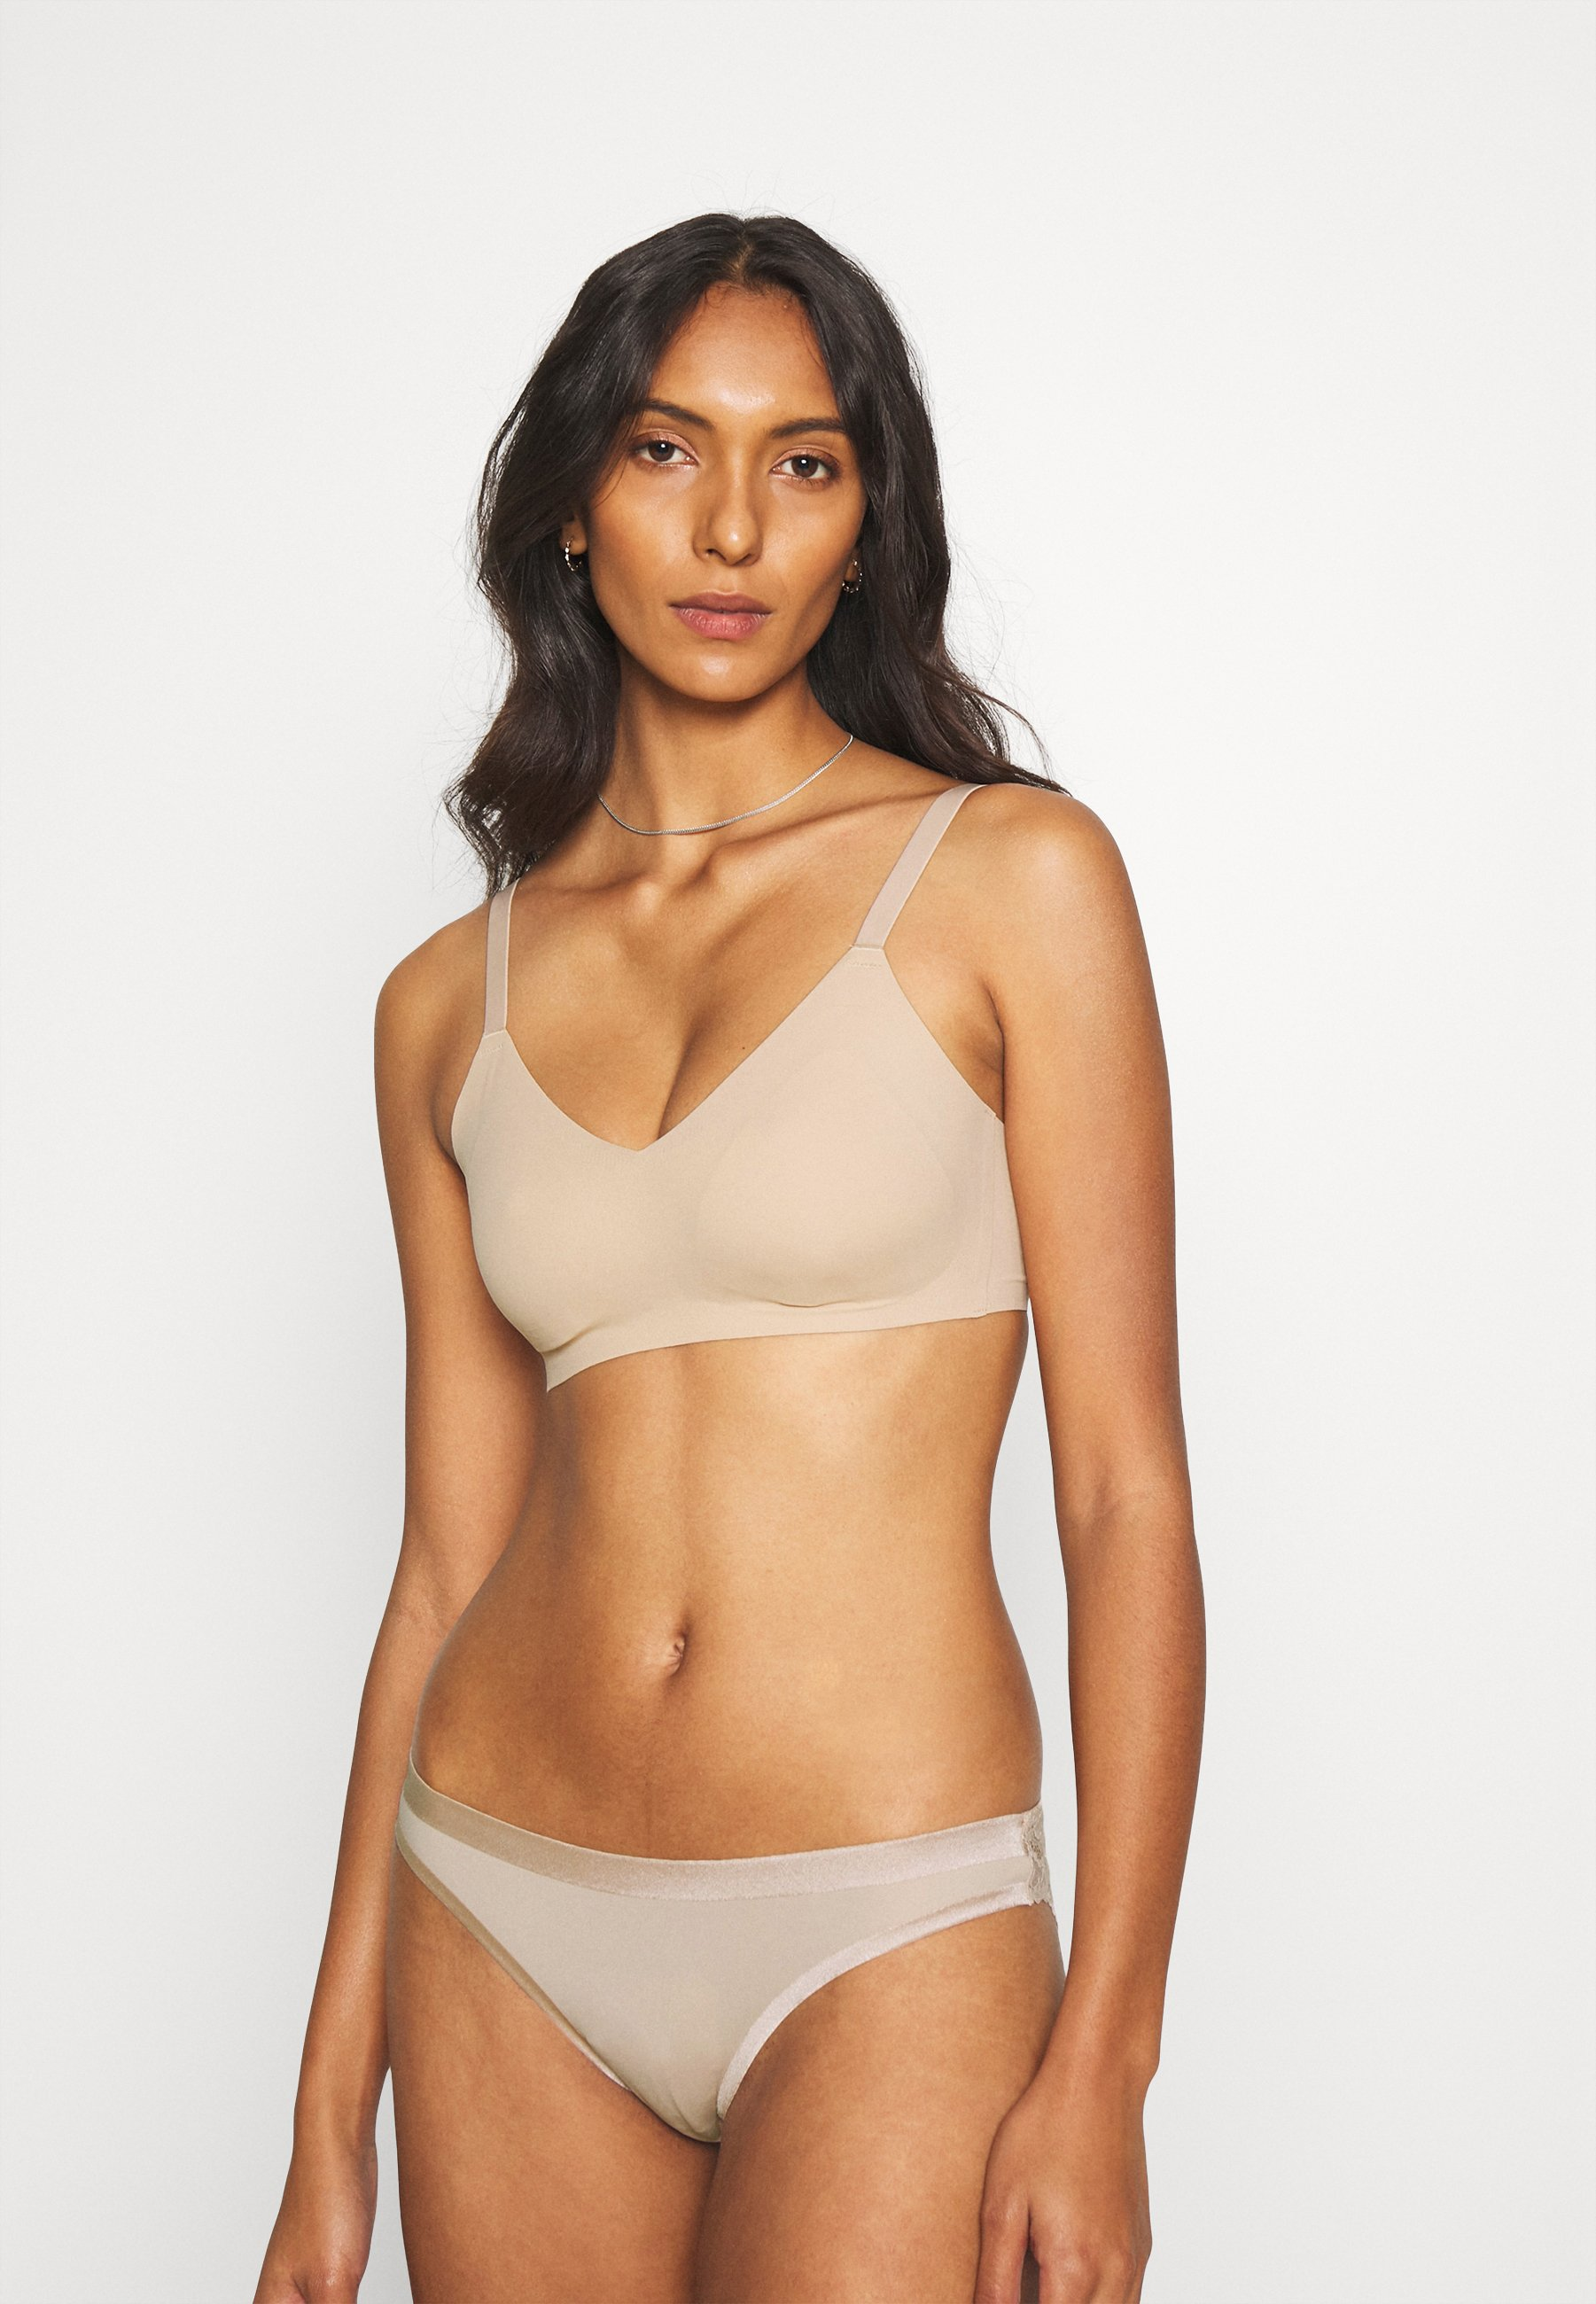 Women REAL FREE BRALETTE BRANDIX - Triangle bra